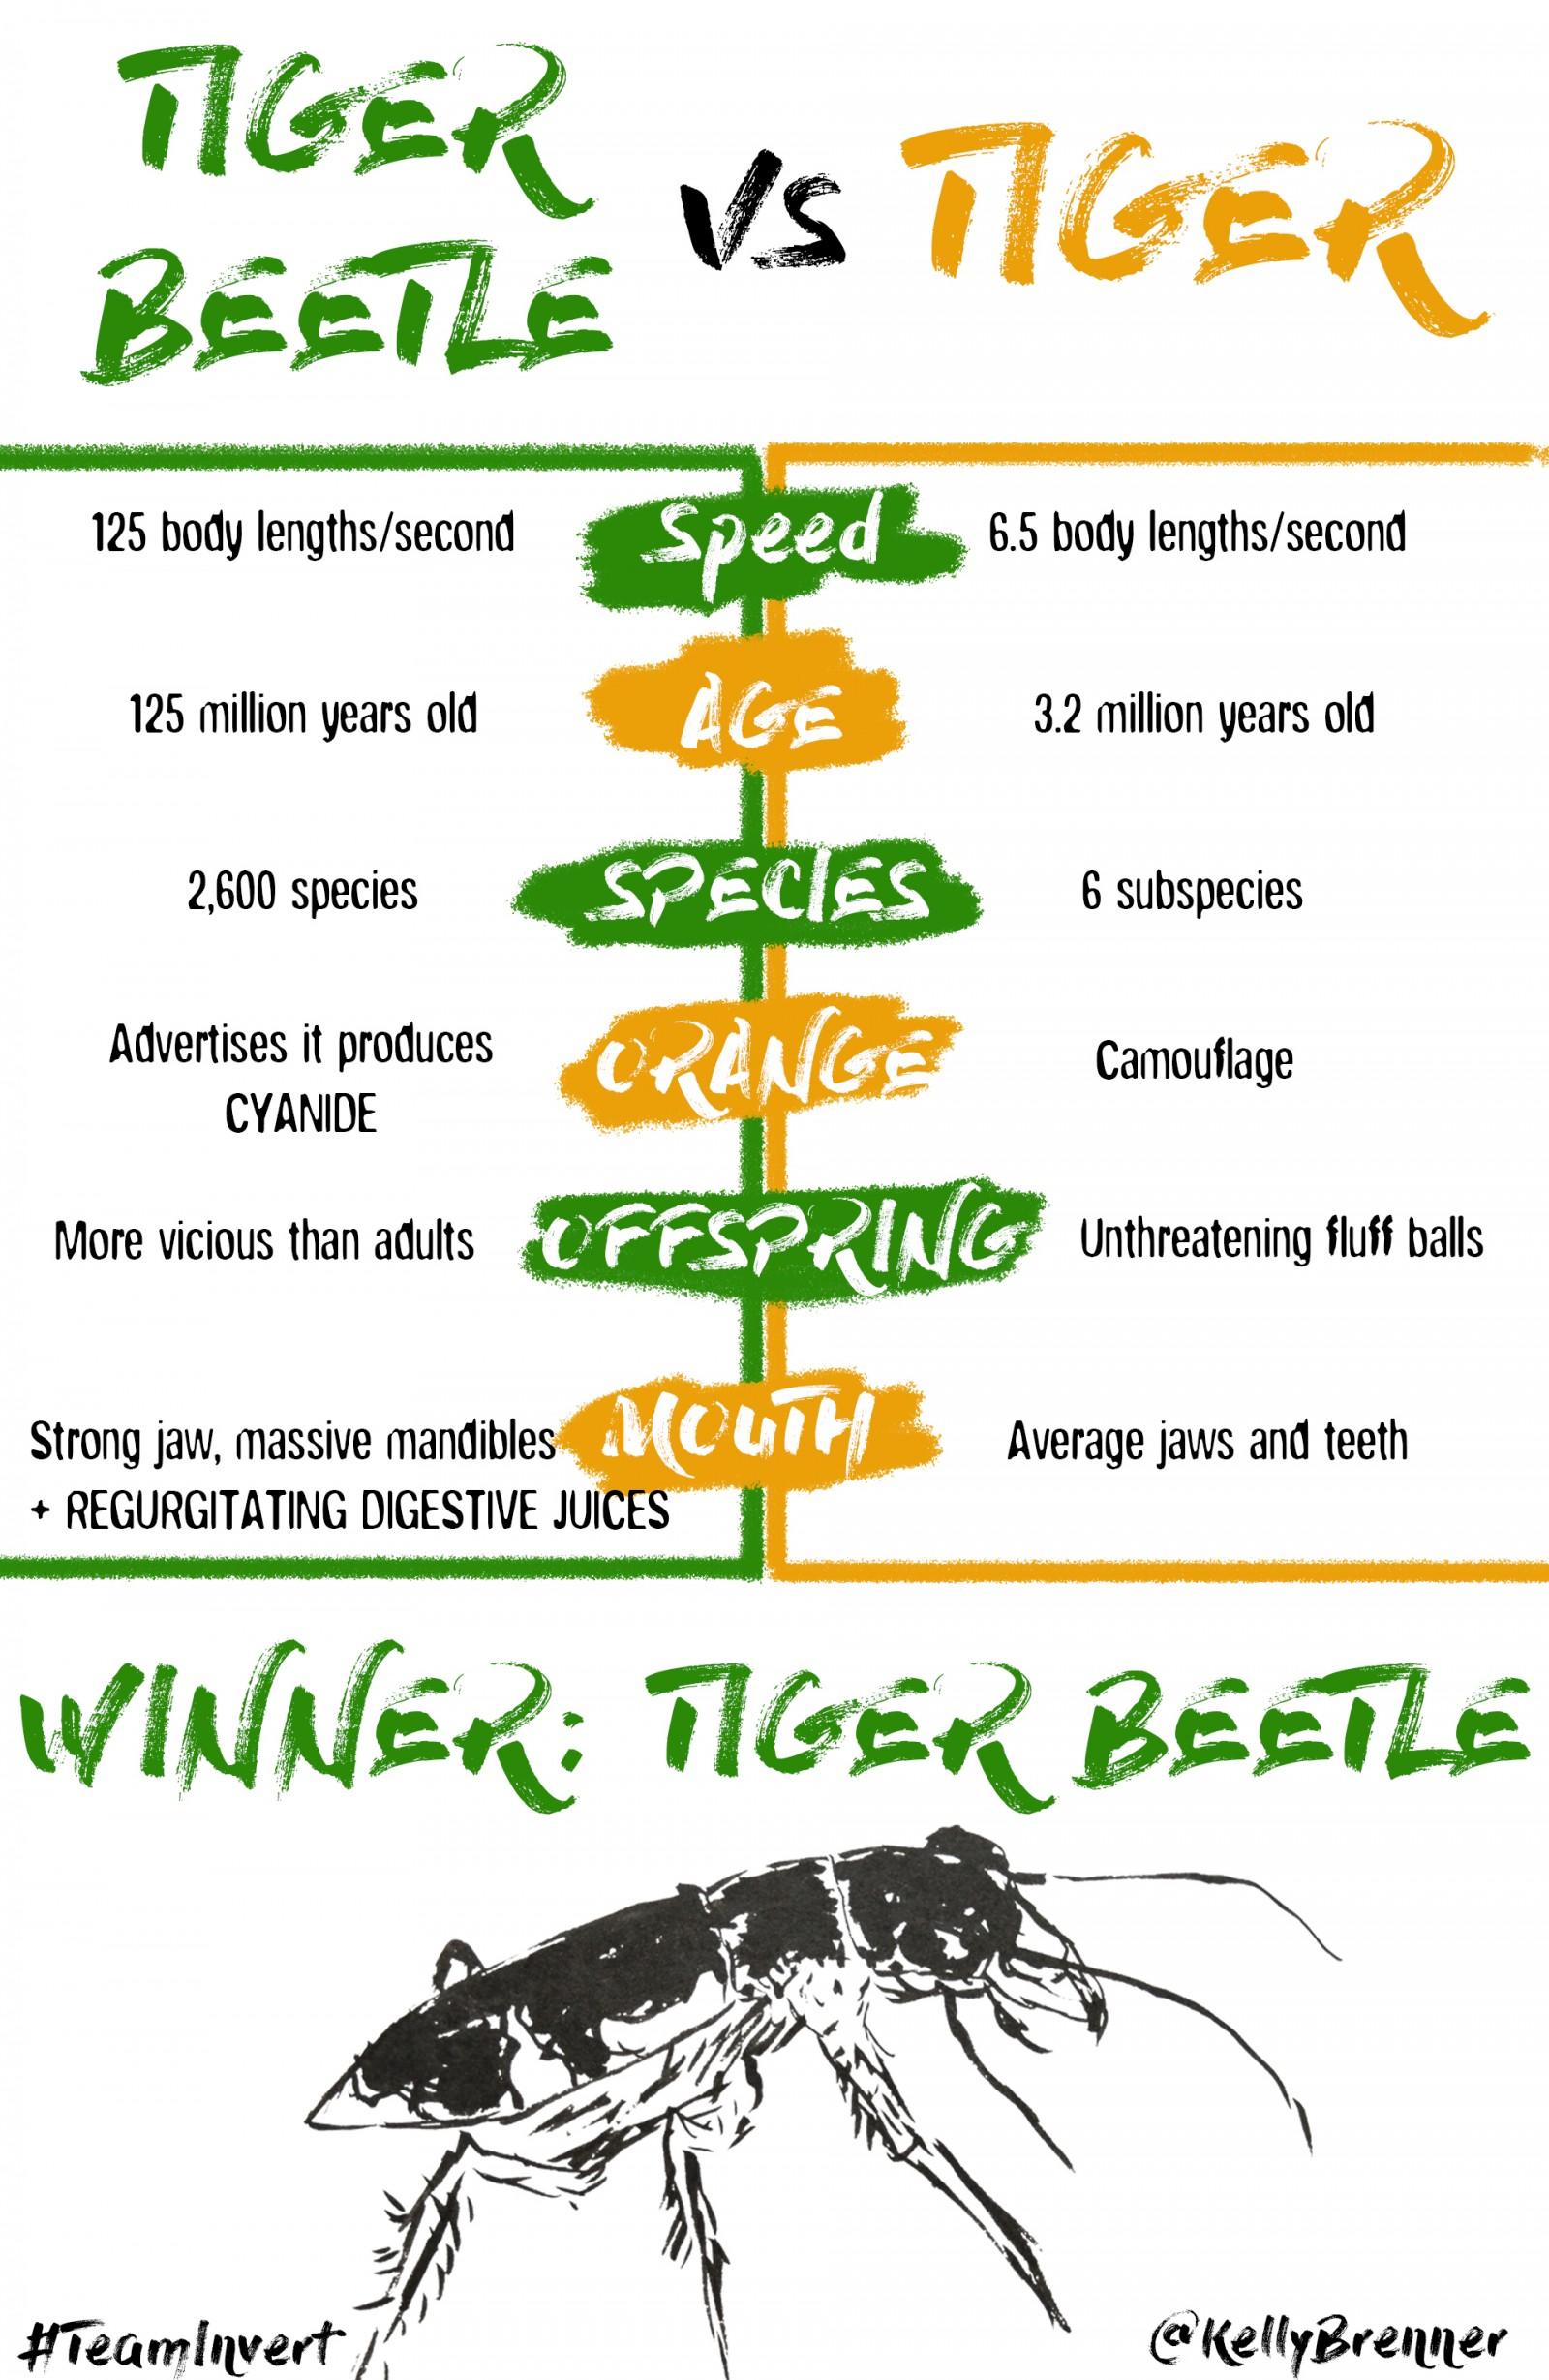 tiger-beetle-vs-tiger2